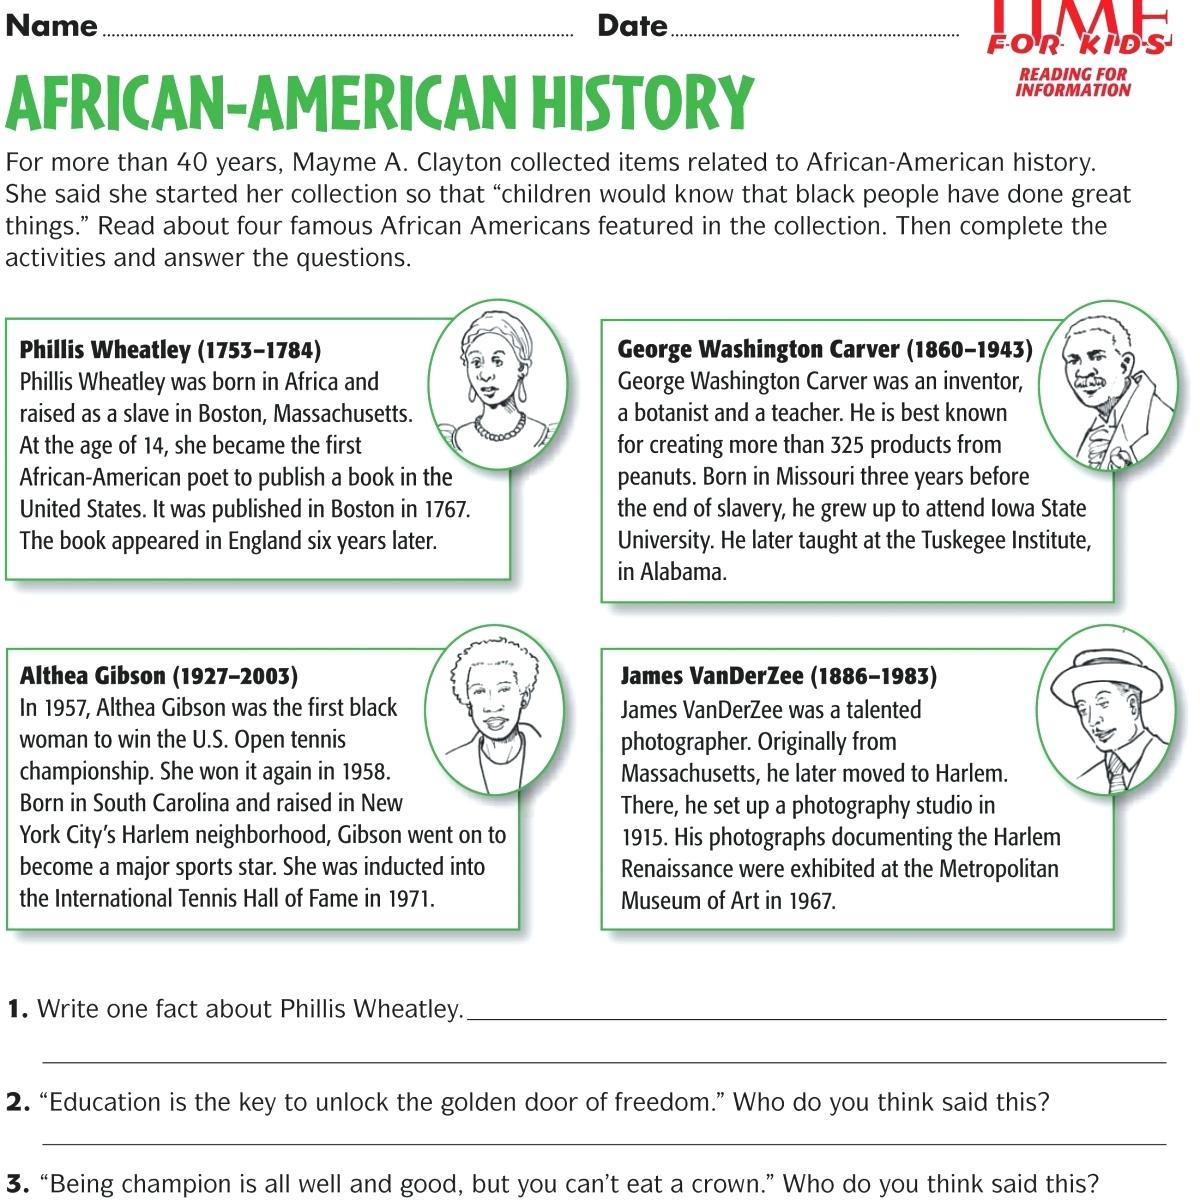 3Rd Grade Social Studies Worksheets For Download Free - Math - Free | Grade 3 Social Studies Worksheets Printable